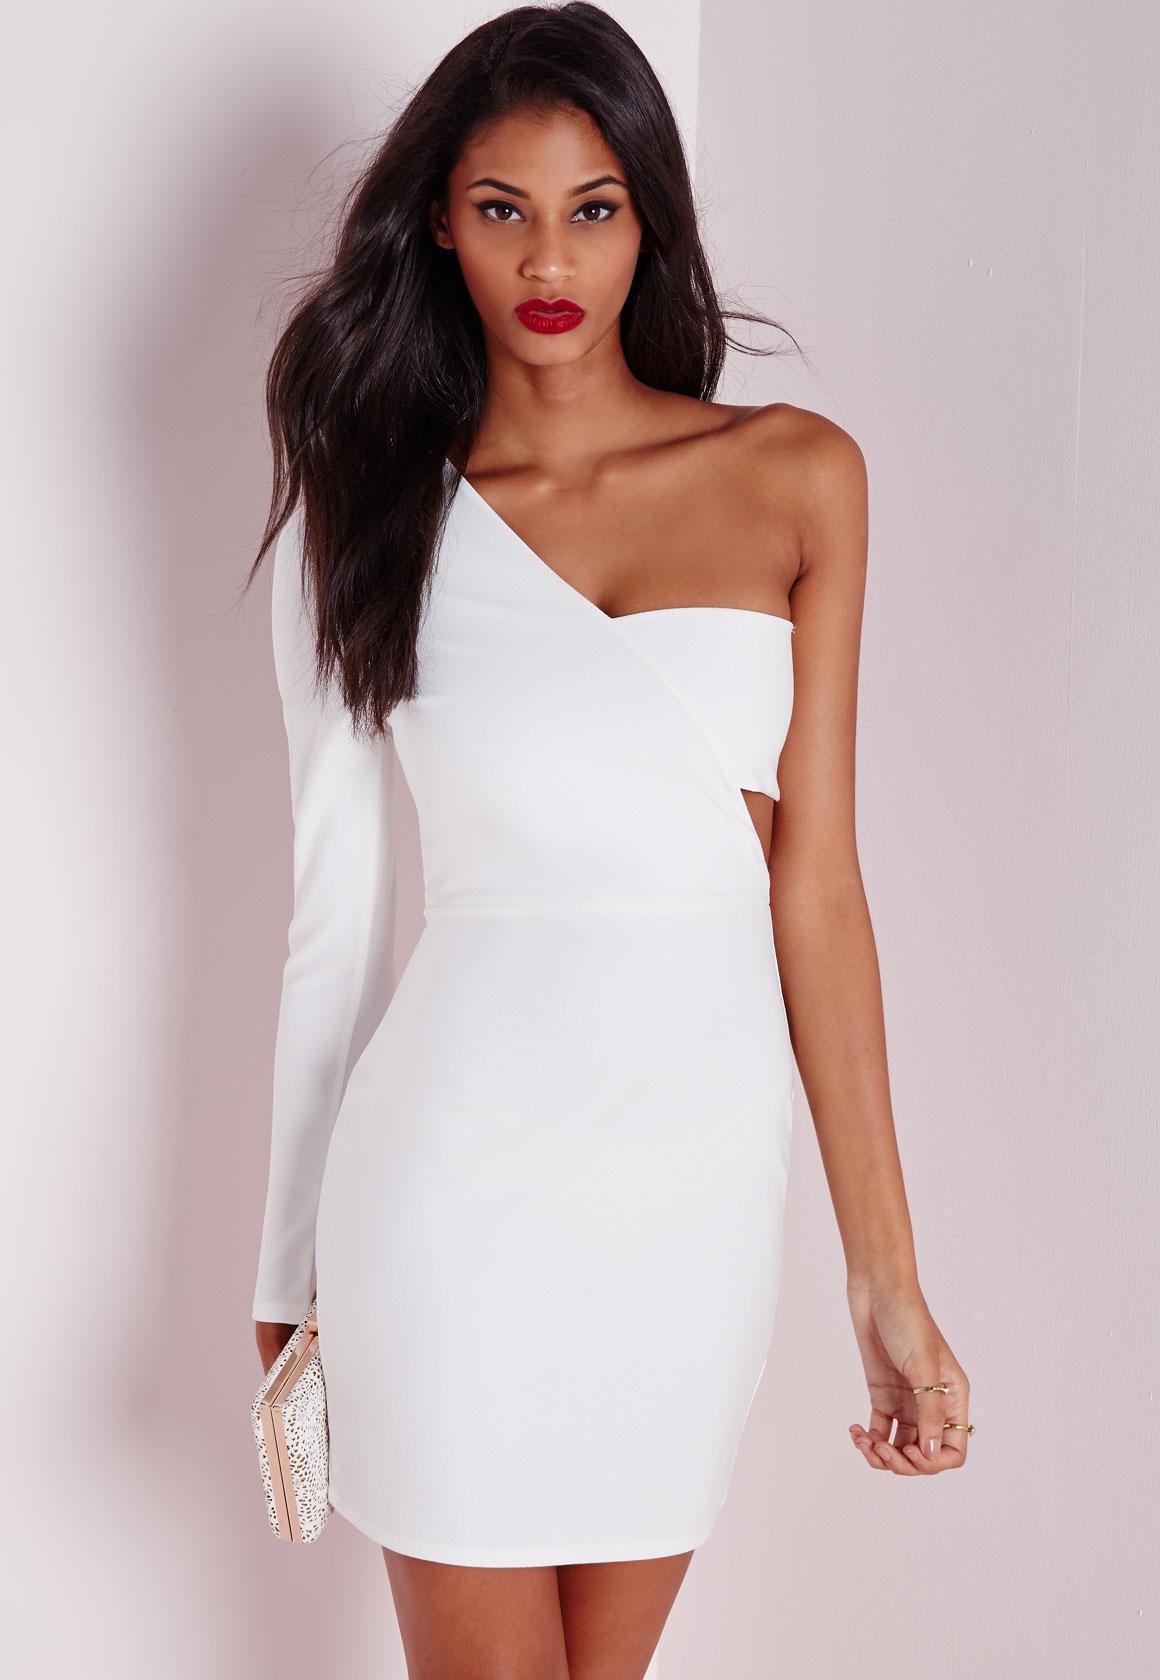 Crepe One Shoulder Bodycon Dress White - Dresses - Bodycon Dresses ...